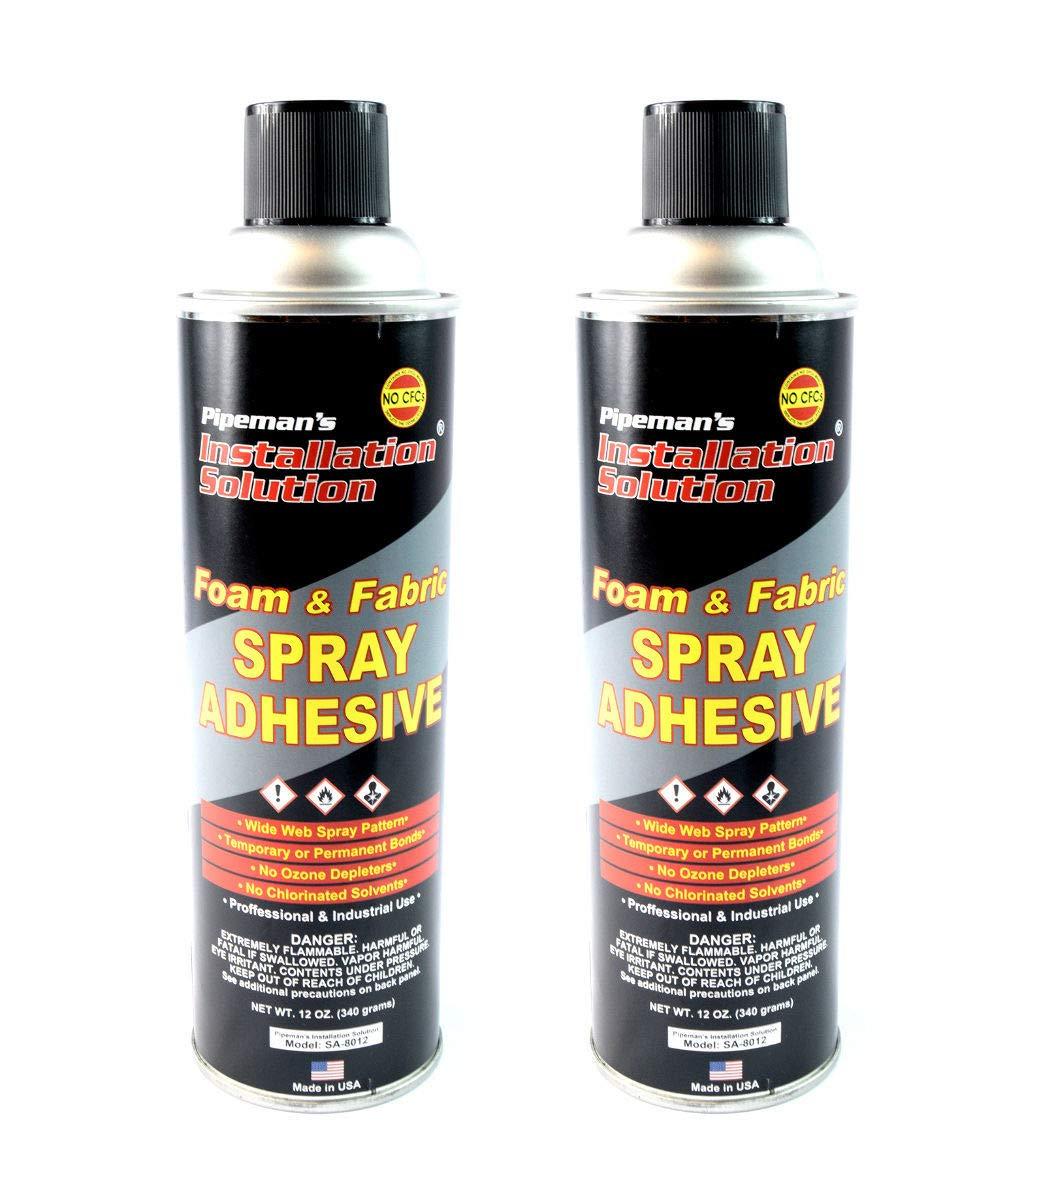 2 Pack Professional Foam Fabric Upholstery Leather Aerosal Adhesive Glue Spray by Nippon America